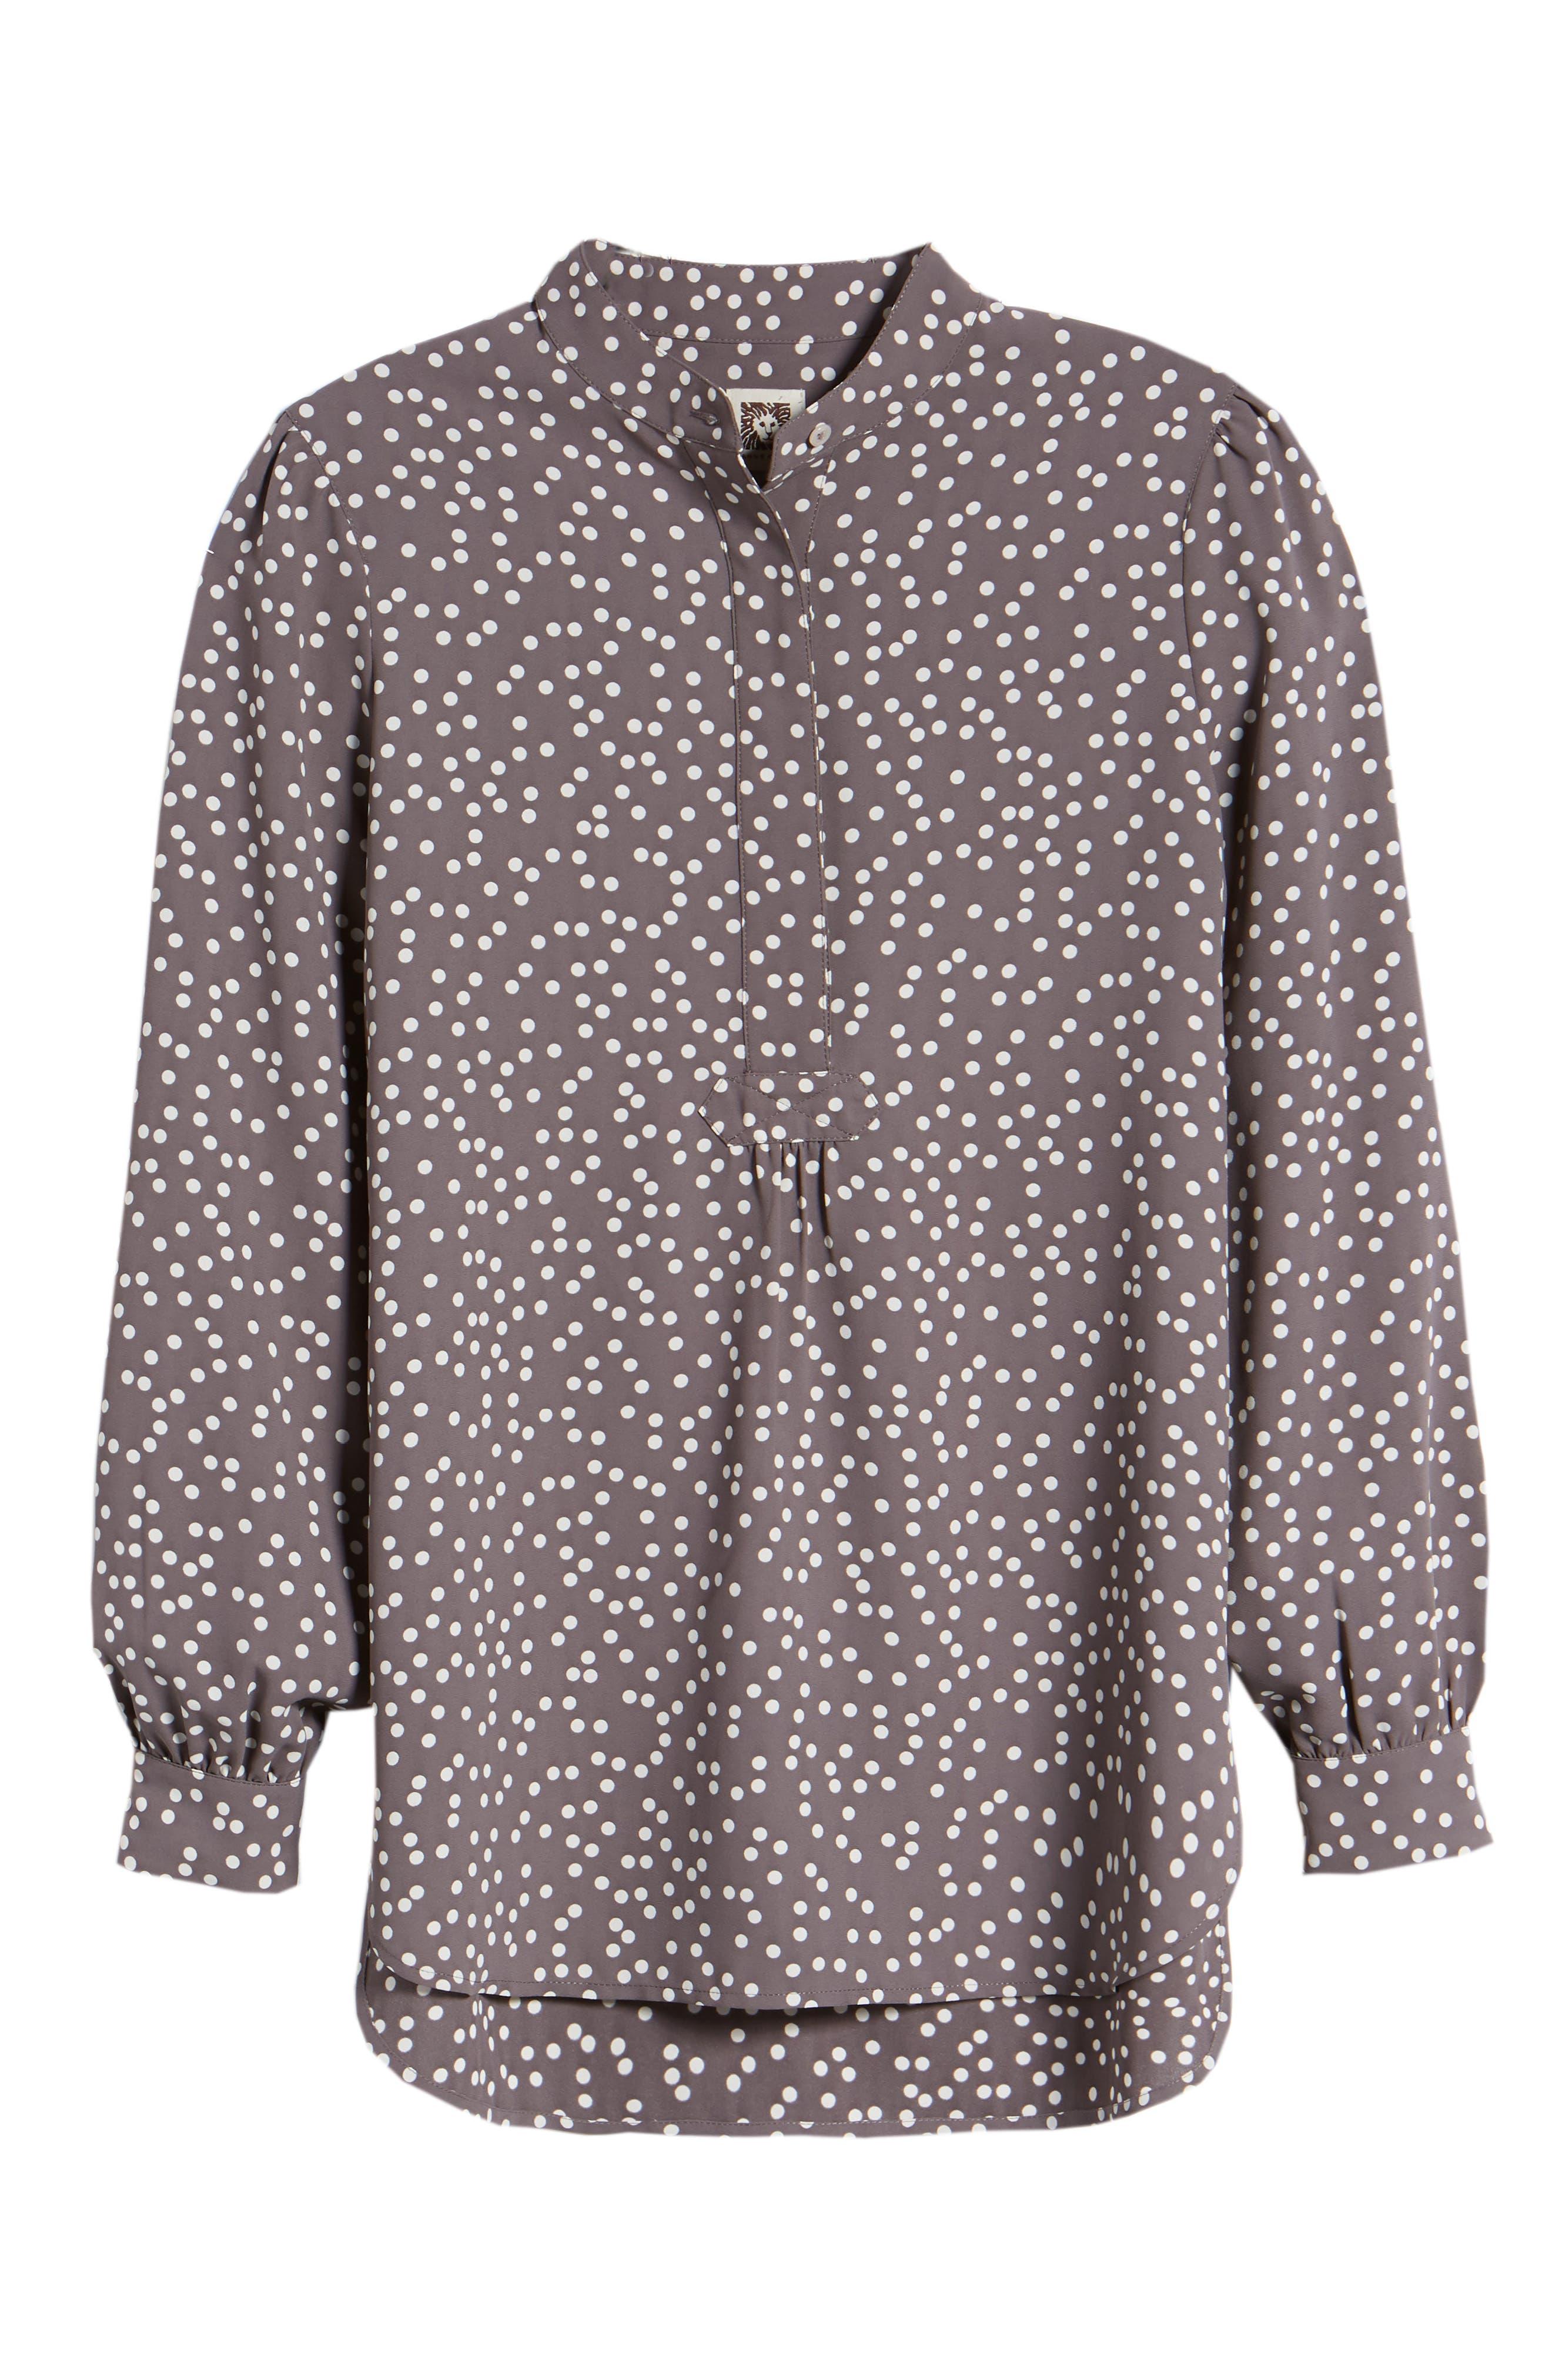 Dot Print Long Sleeve Blouse,                             Alternate thumbnail 7, color,                             Nantucket Grey/ Oyster Shell